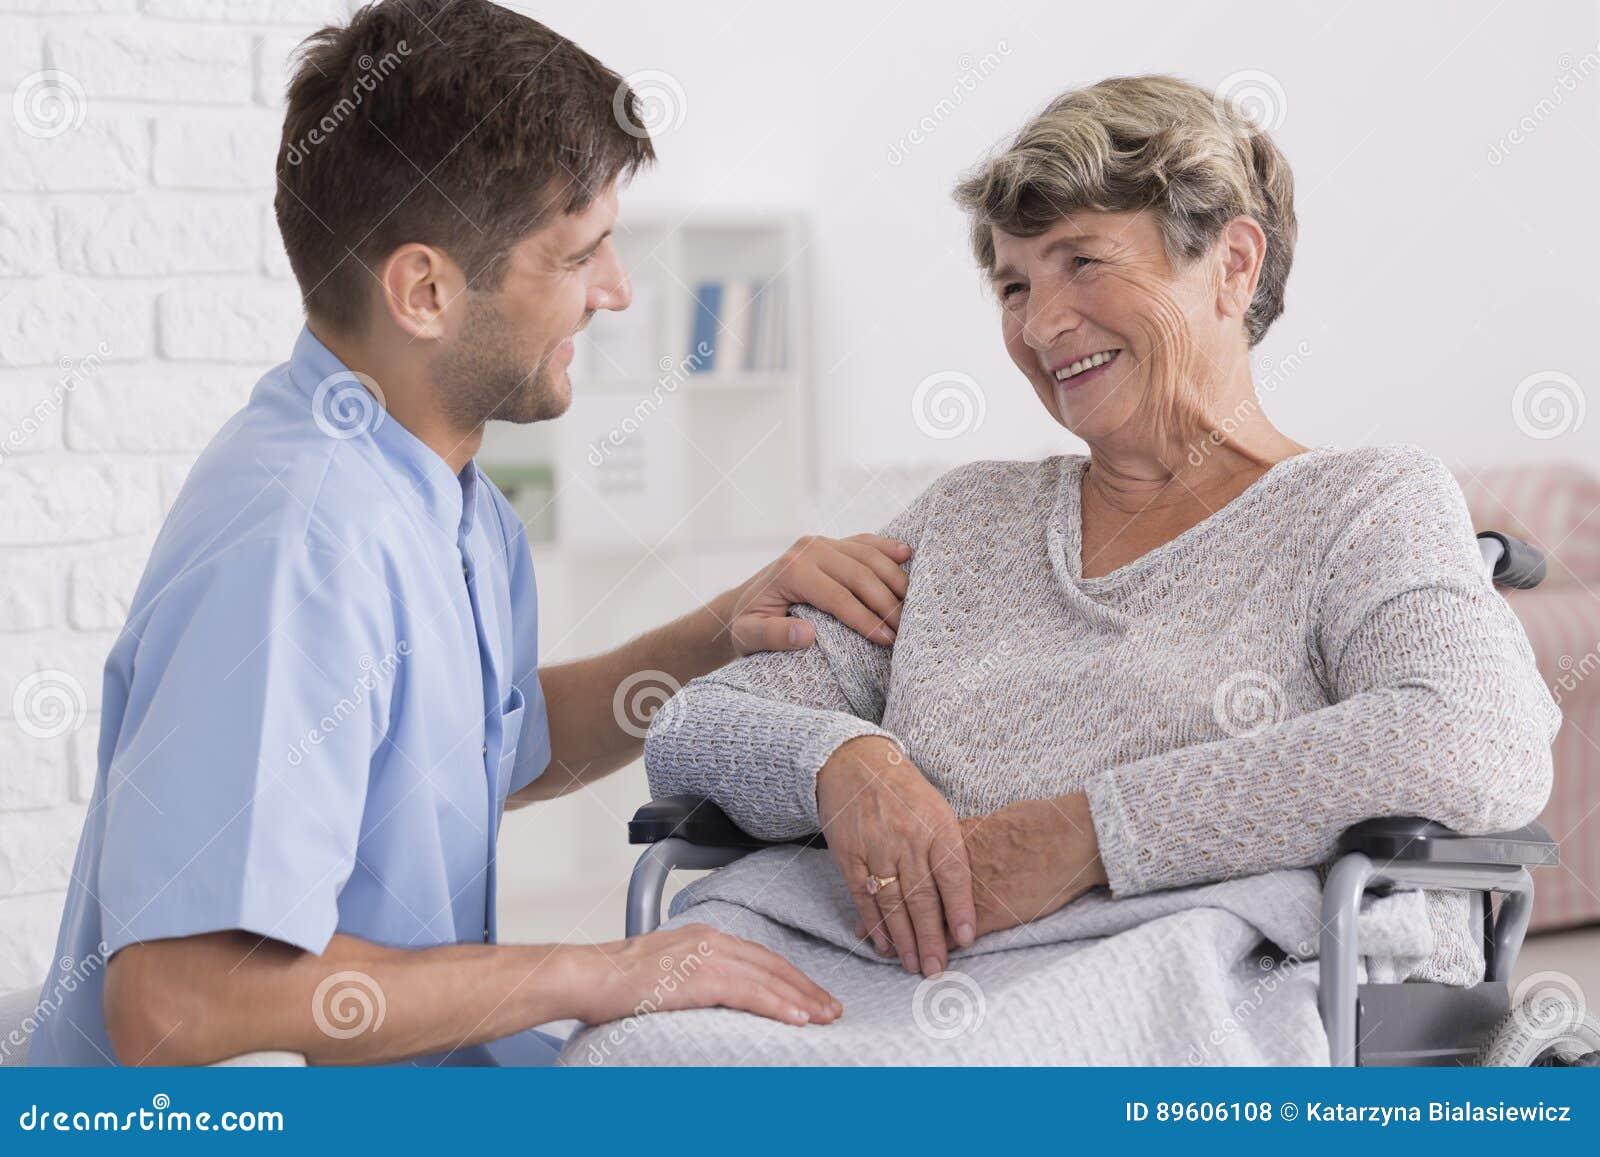 Caregiver comforting elderly woman